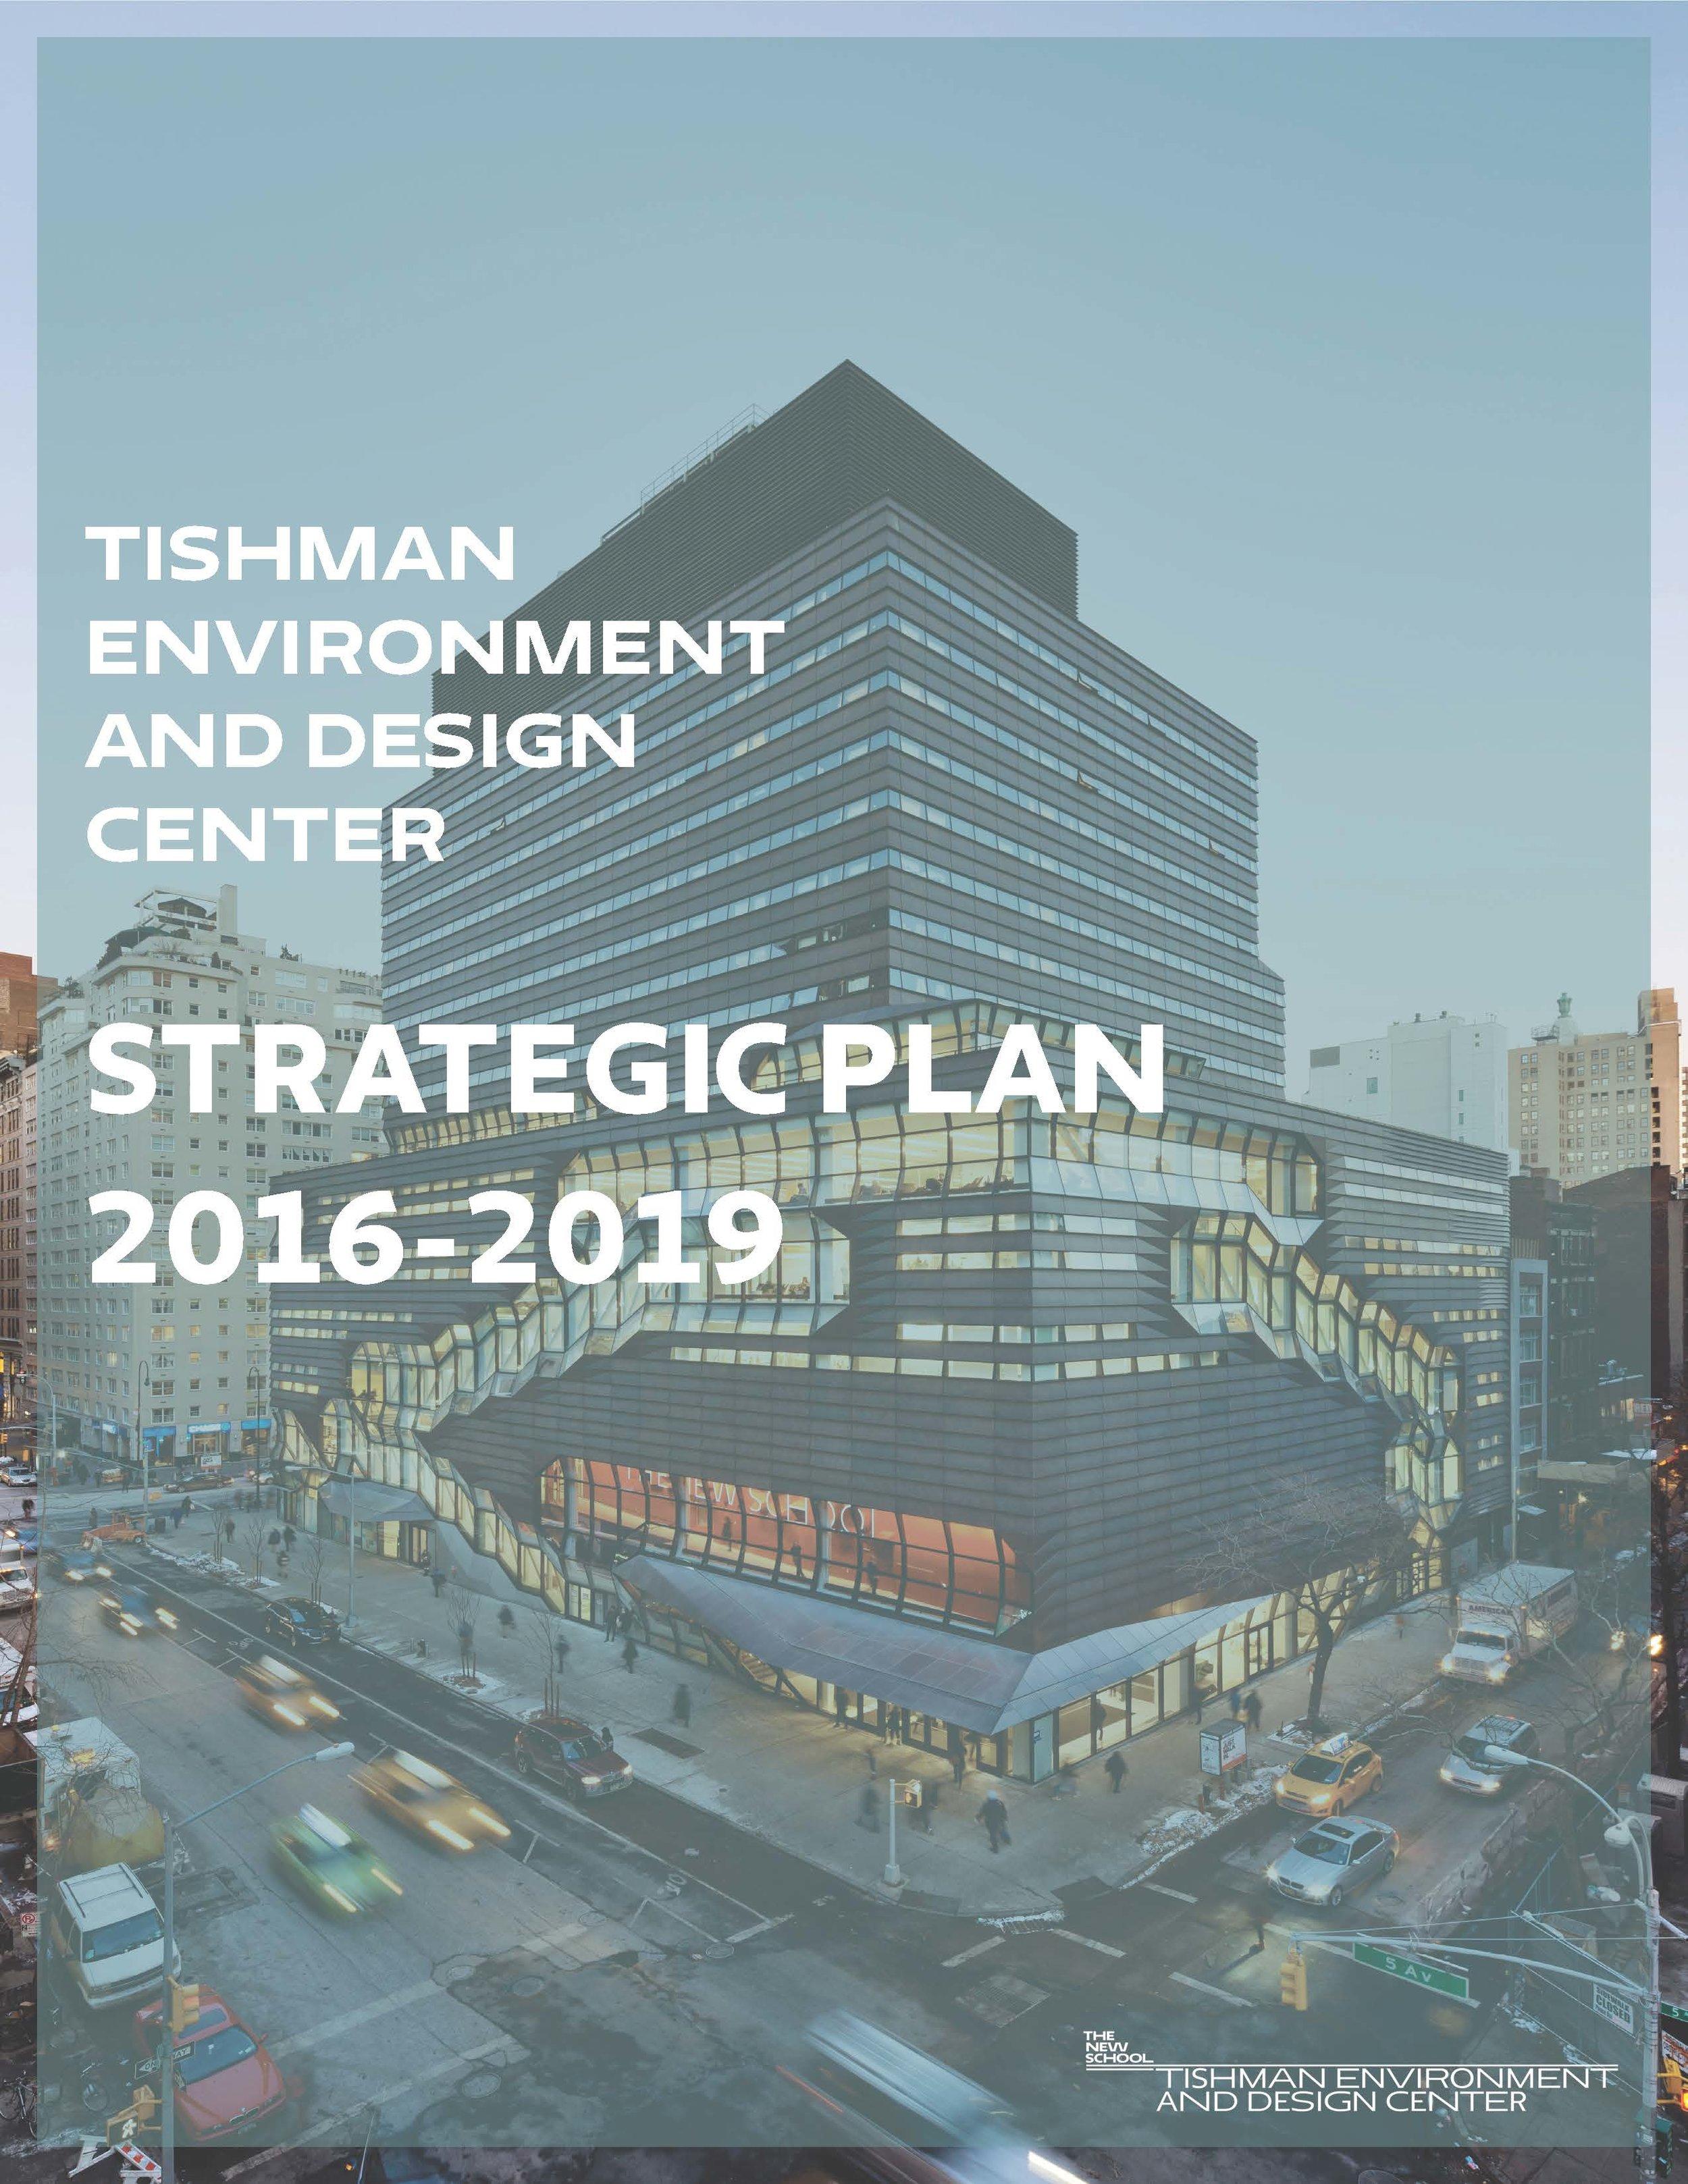 Strategic Plan Image.jpg